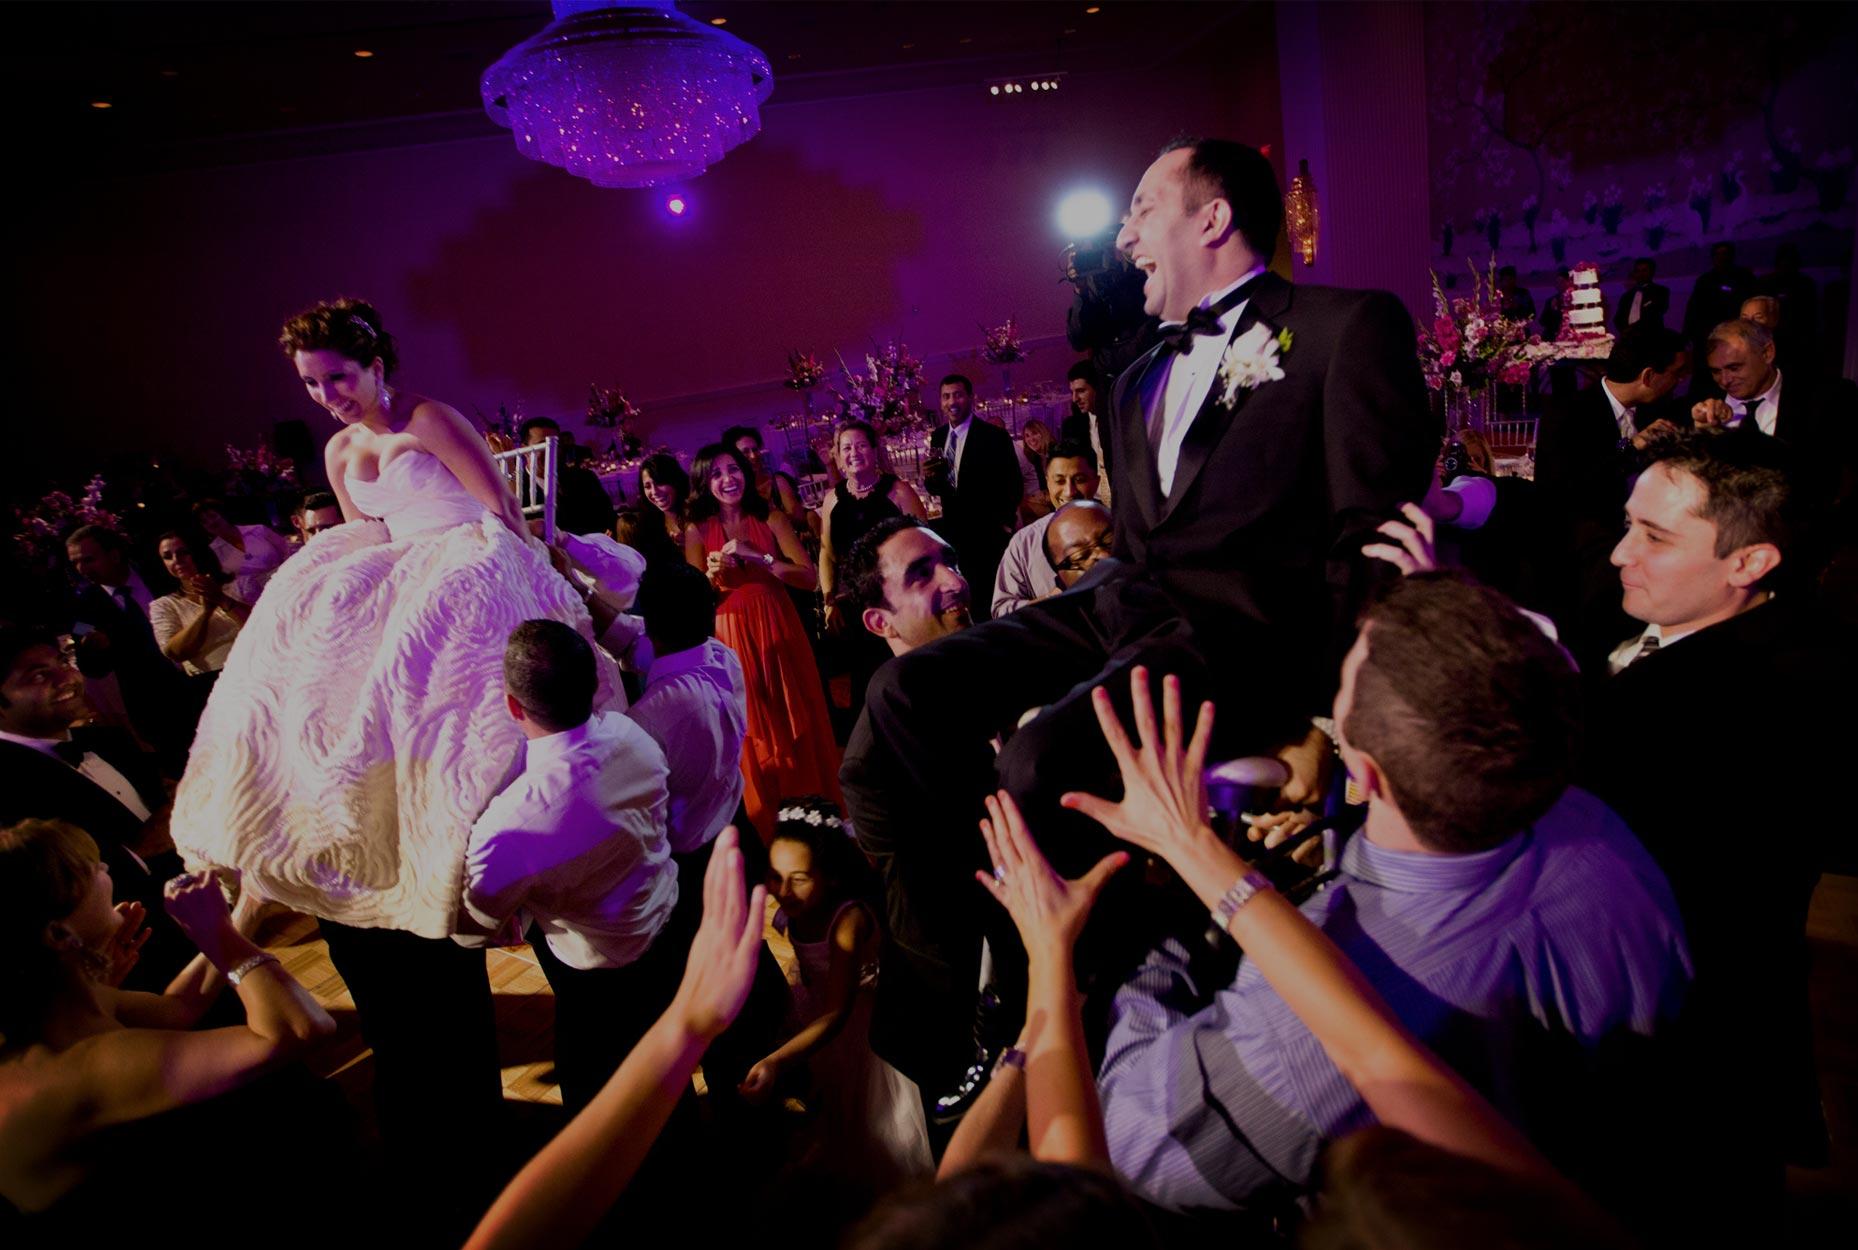 Bruiloft muziek top 10 | 17 Sounds